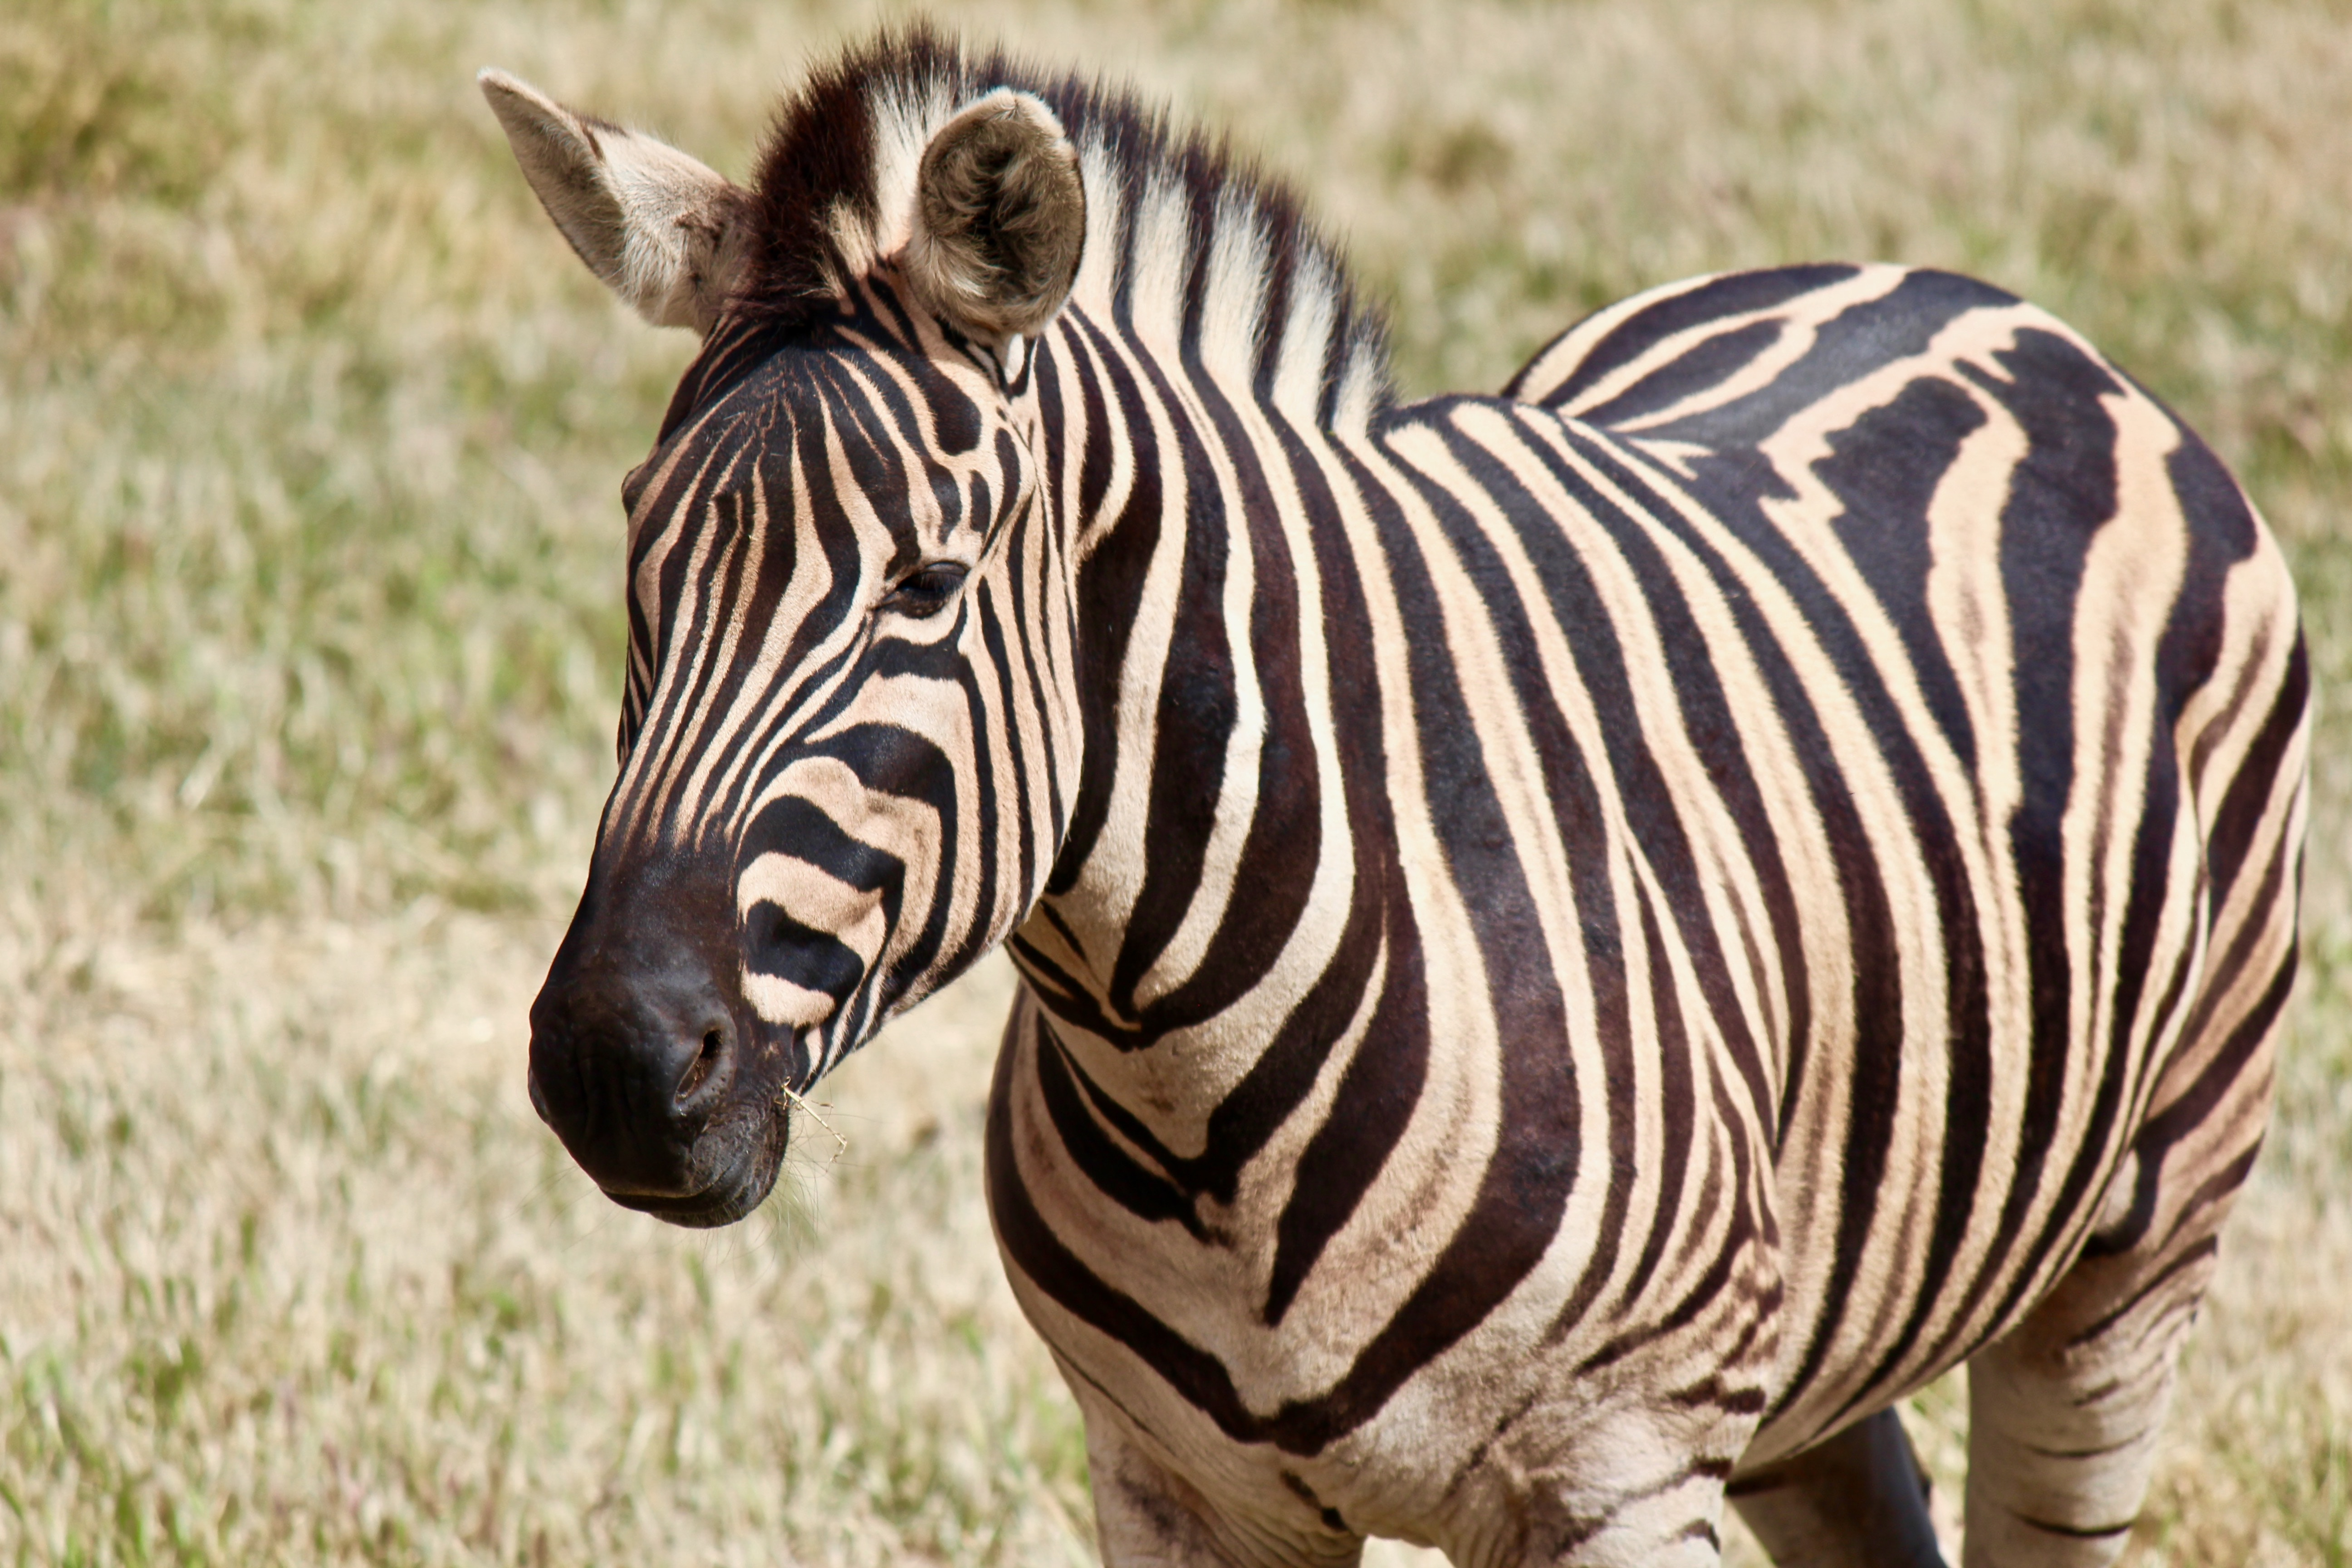 An image of a zebra